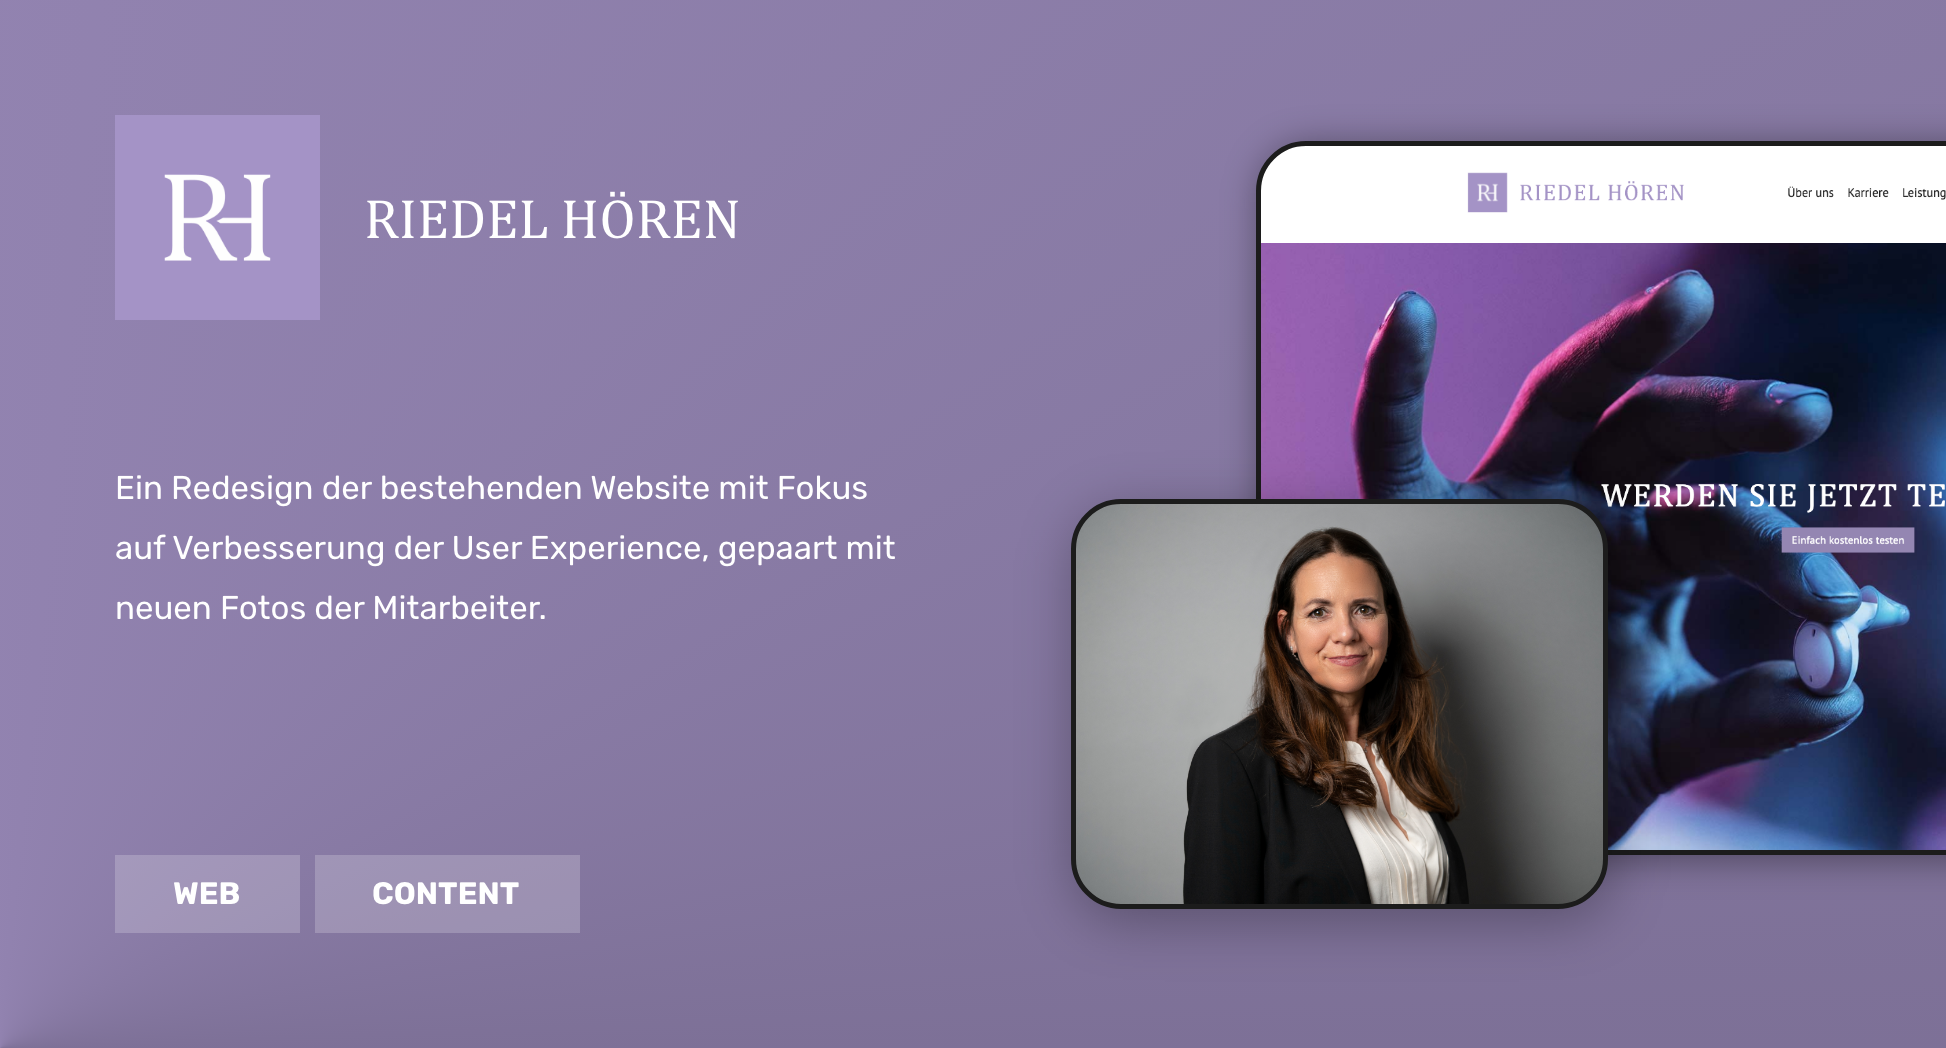 Riedel Hören